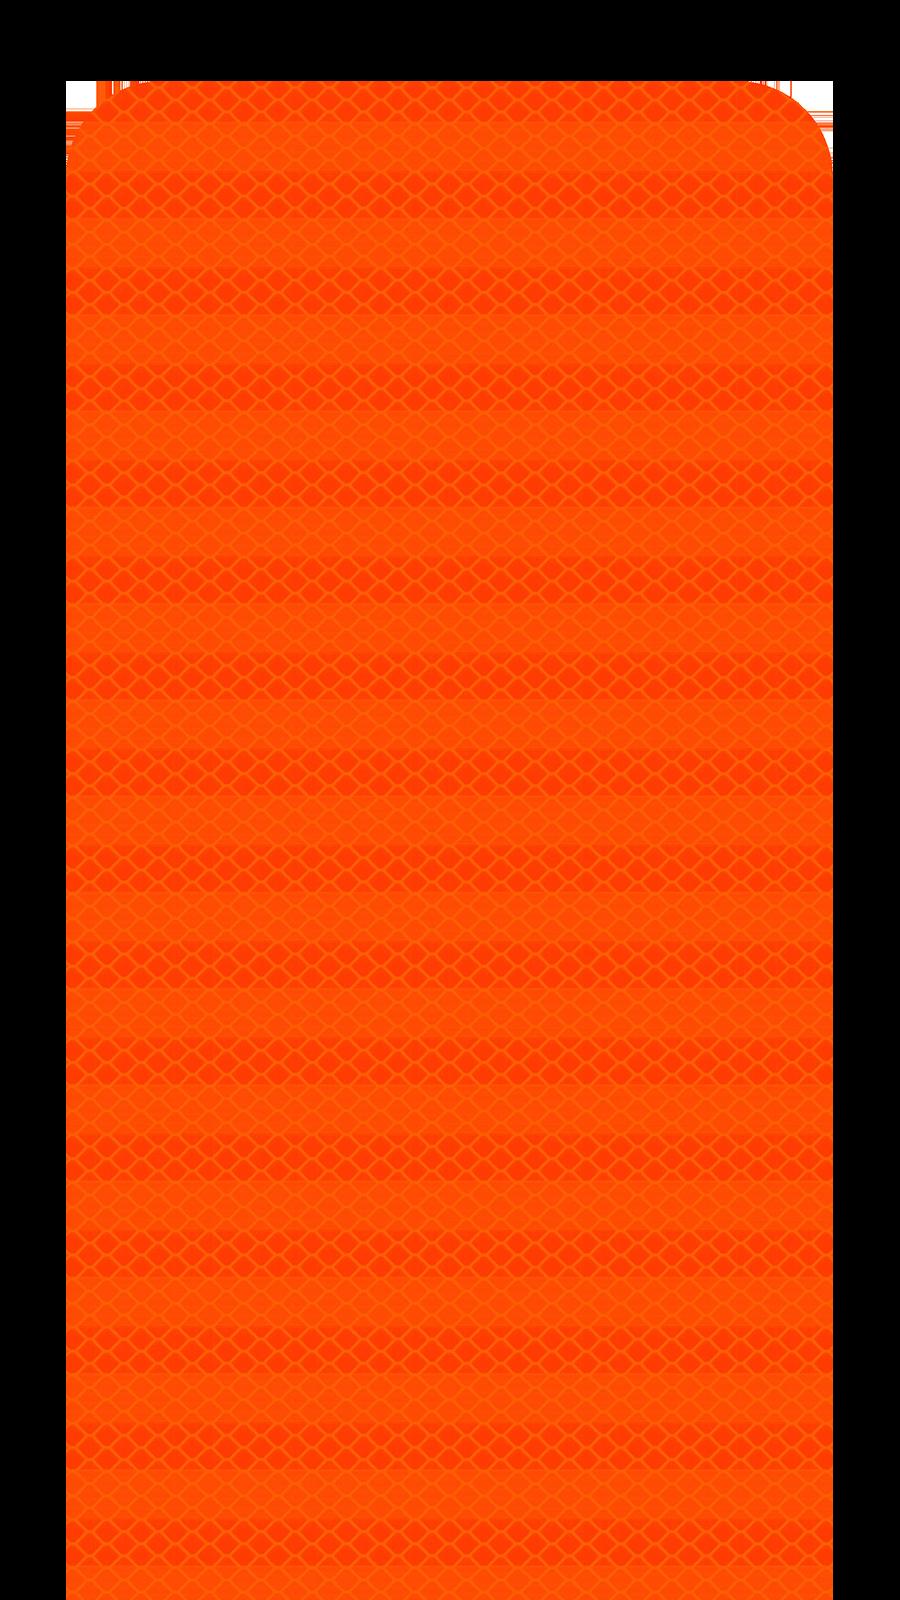 3M™ 3924s Series Fluorescent Orange Diamond Grade Prismatic Sheeting